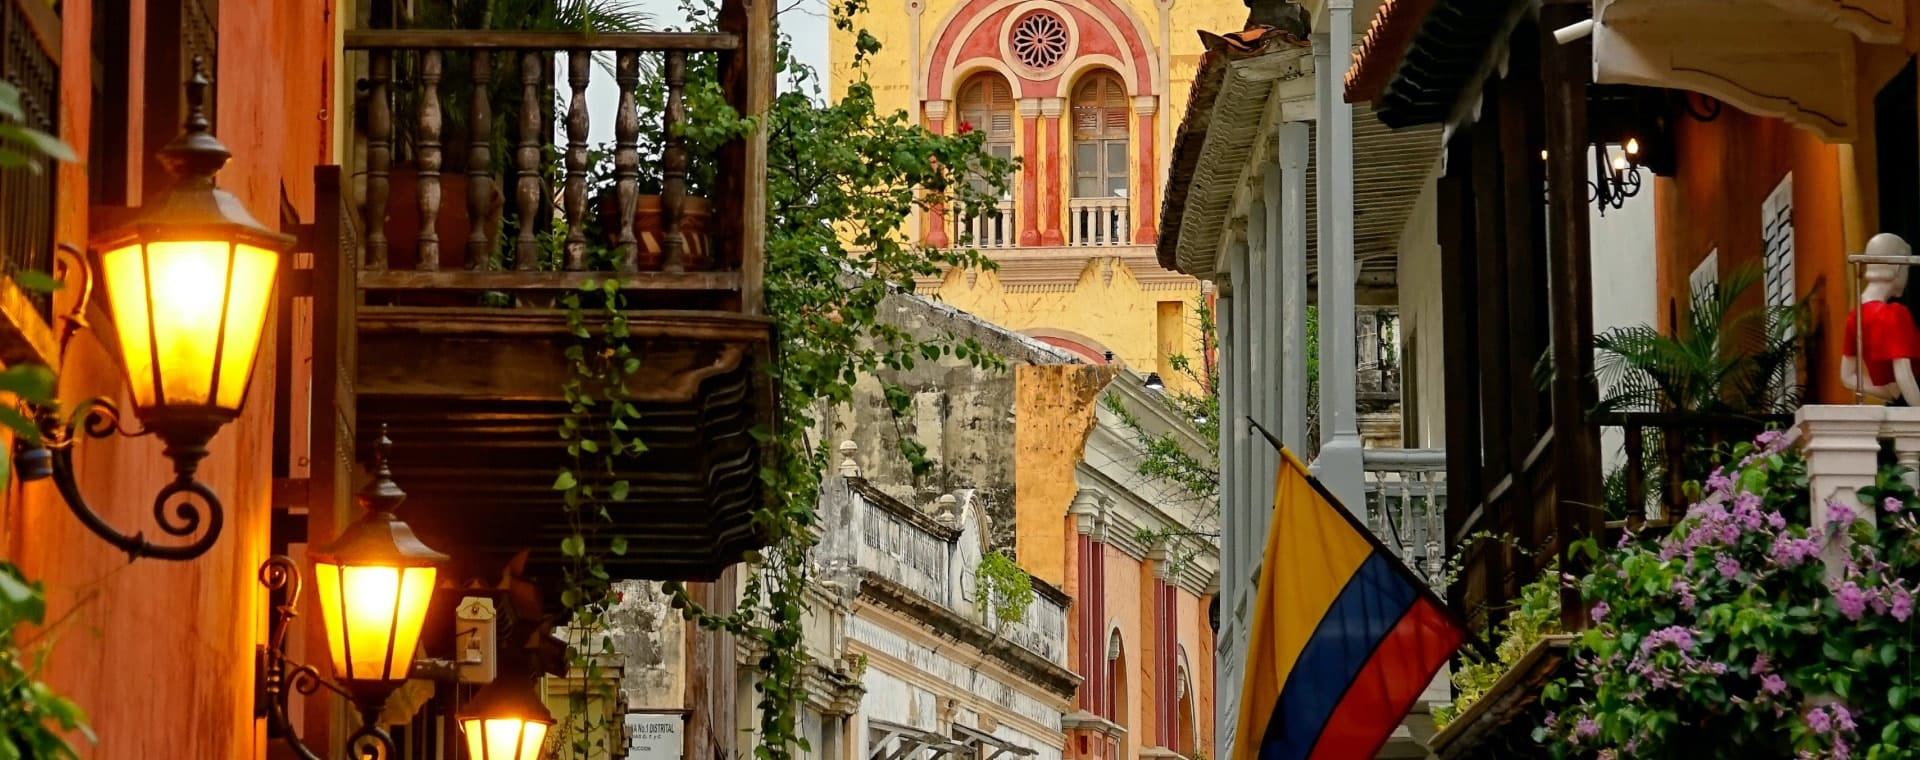 Colombia risks illustration